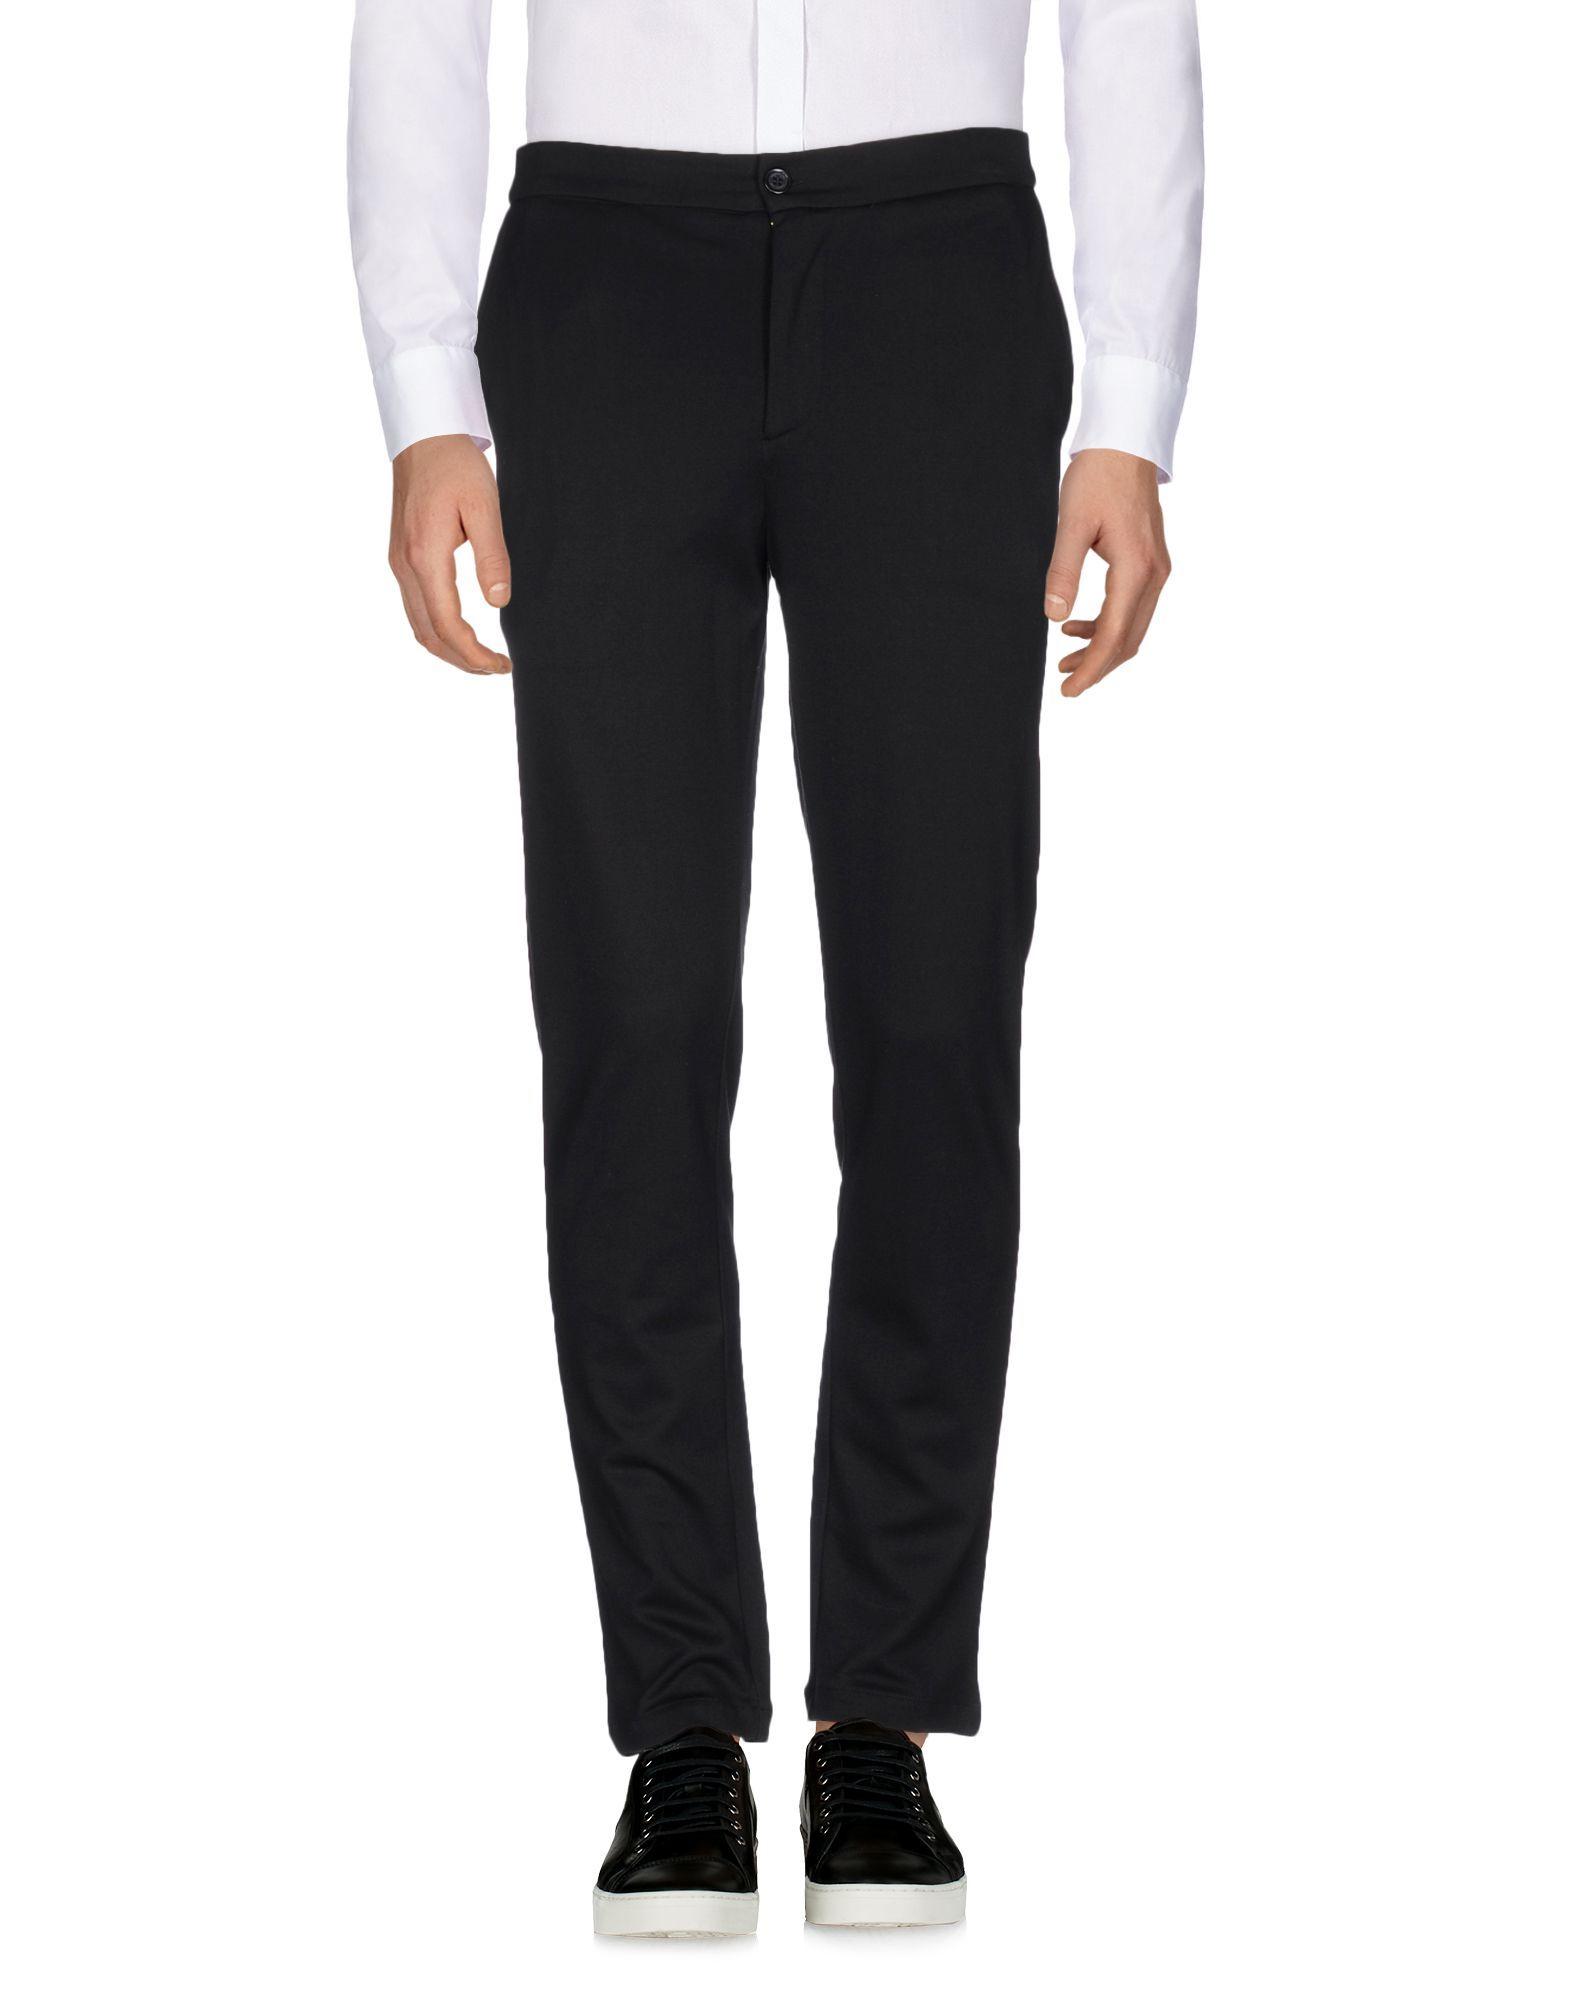 Hamaki-Ho Man Black Casual trousers